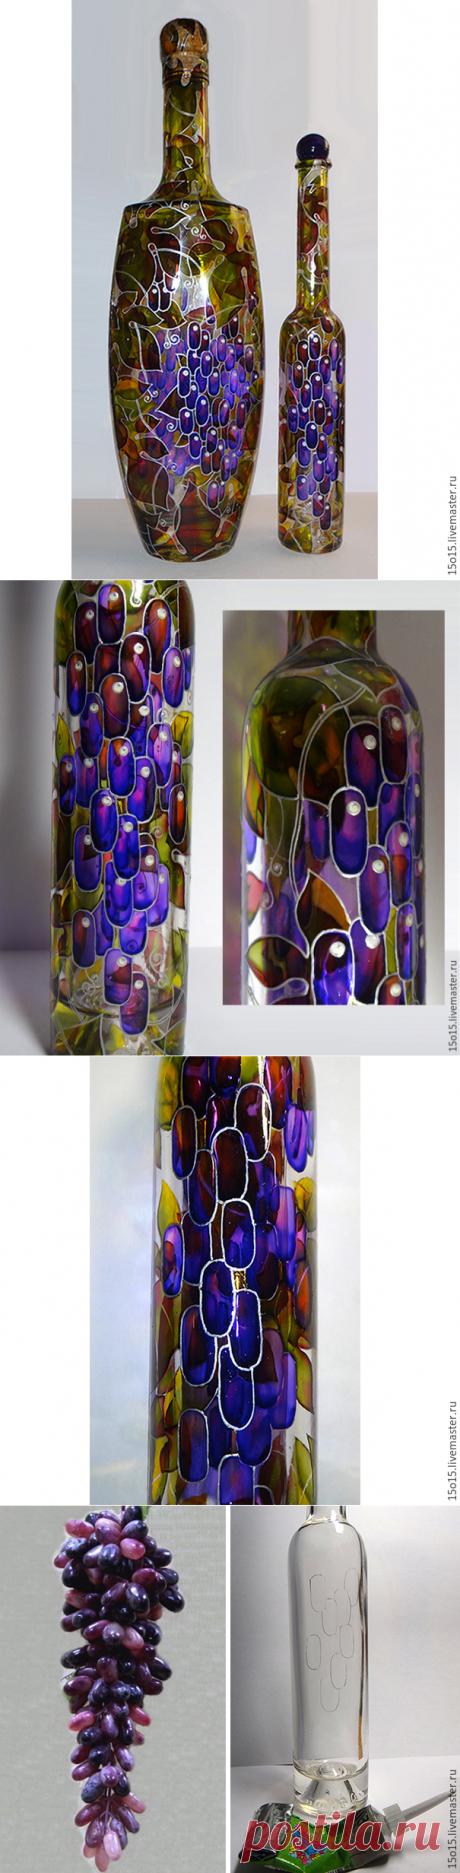 "Мастер-класс ""Волшебные бутылки"" - Ярмарка Мастеров - ручная работа, handmade"